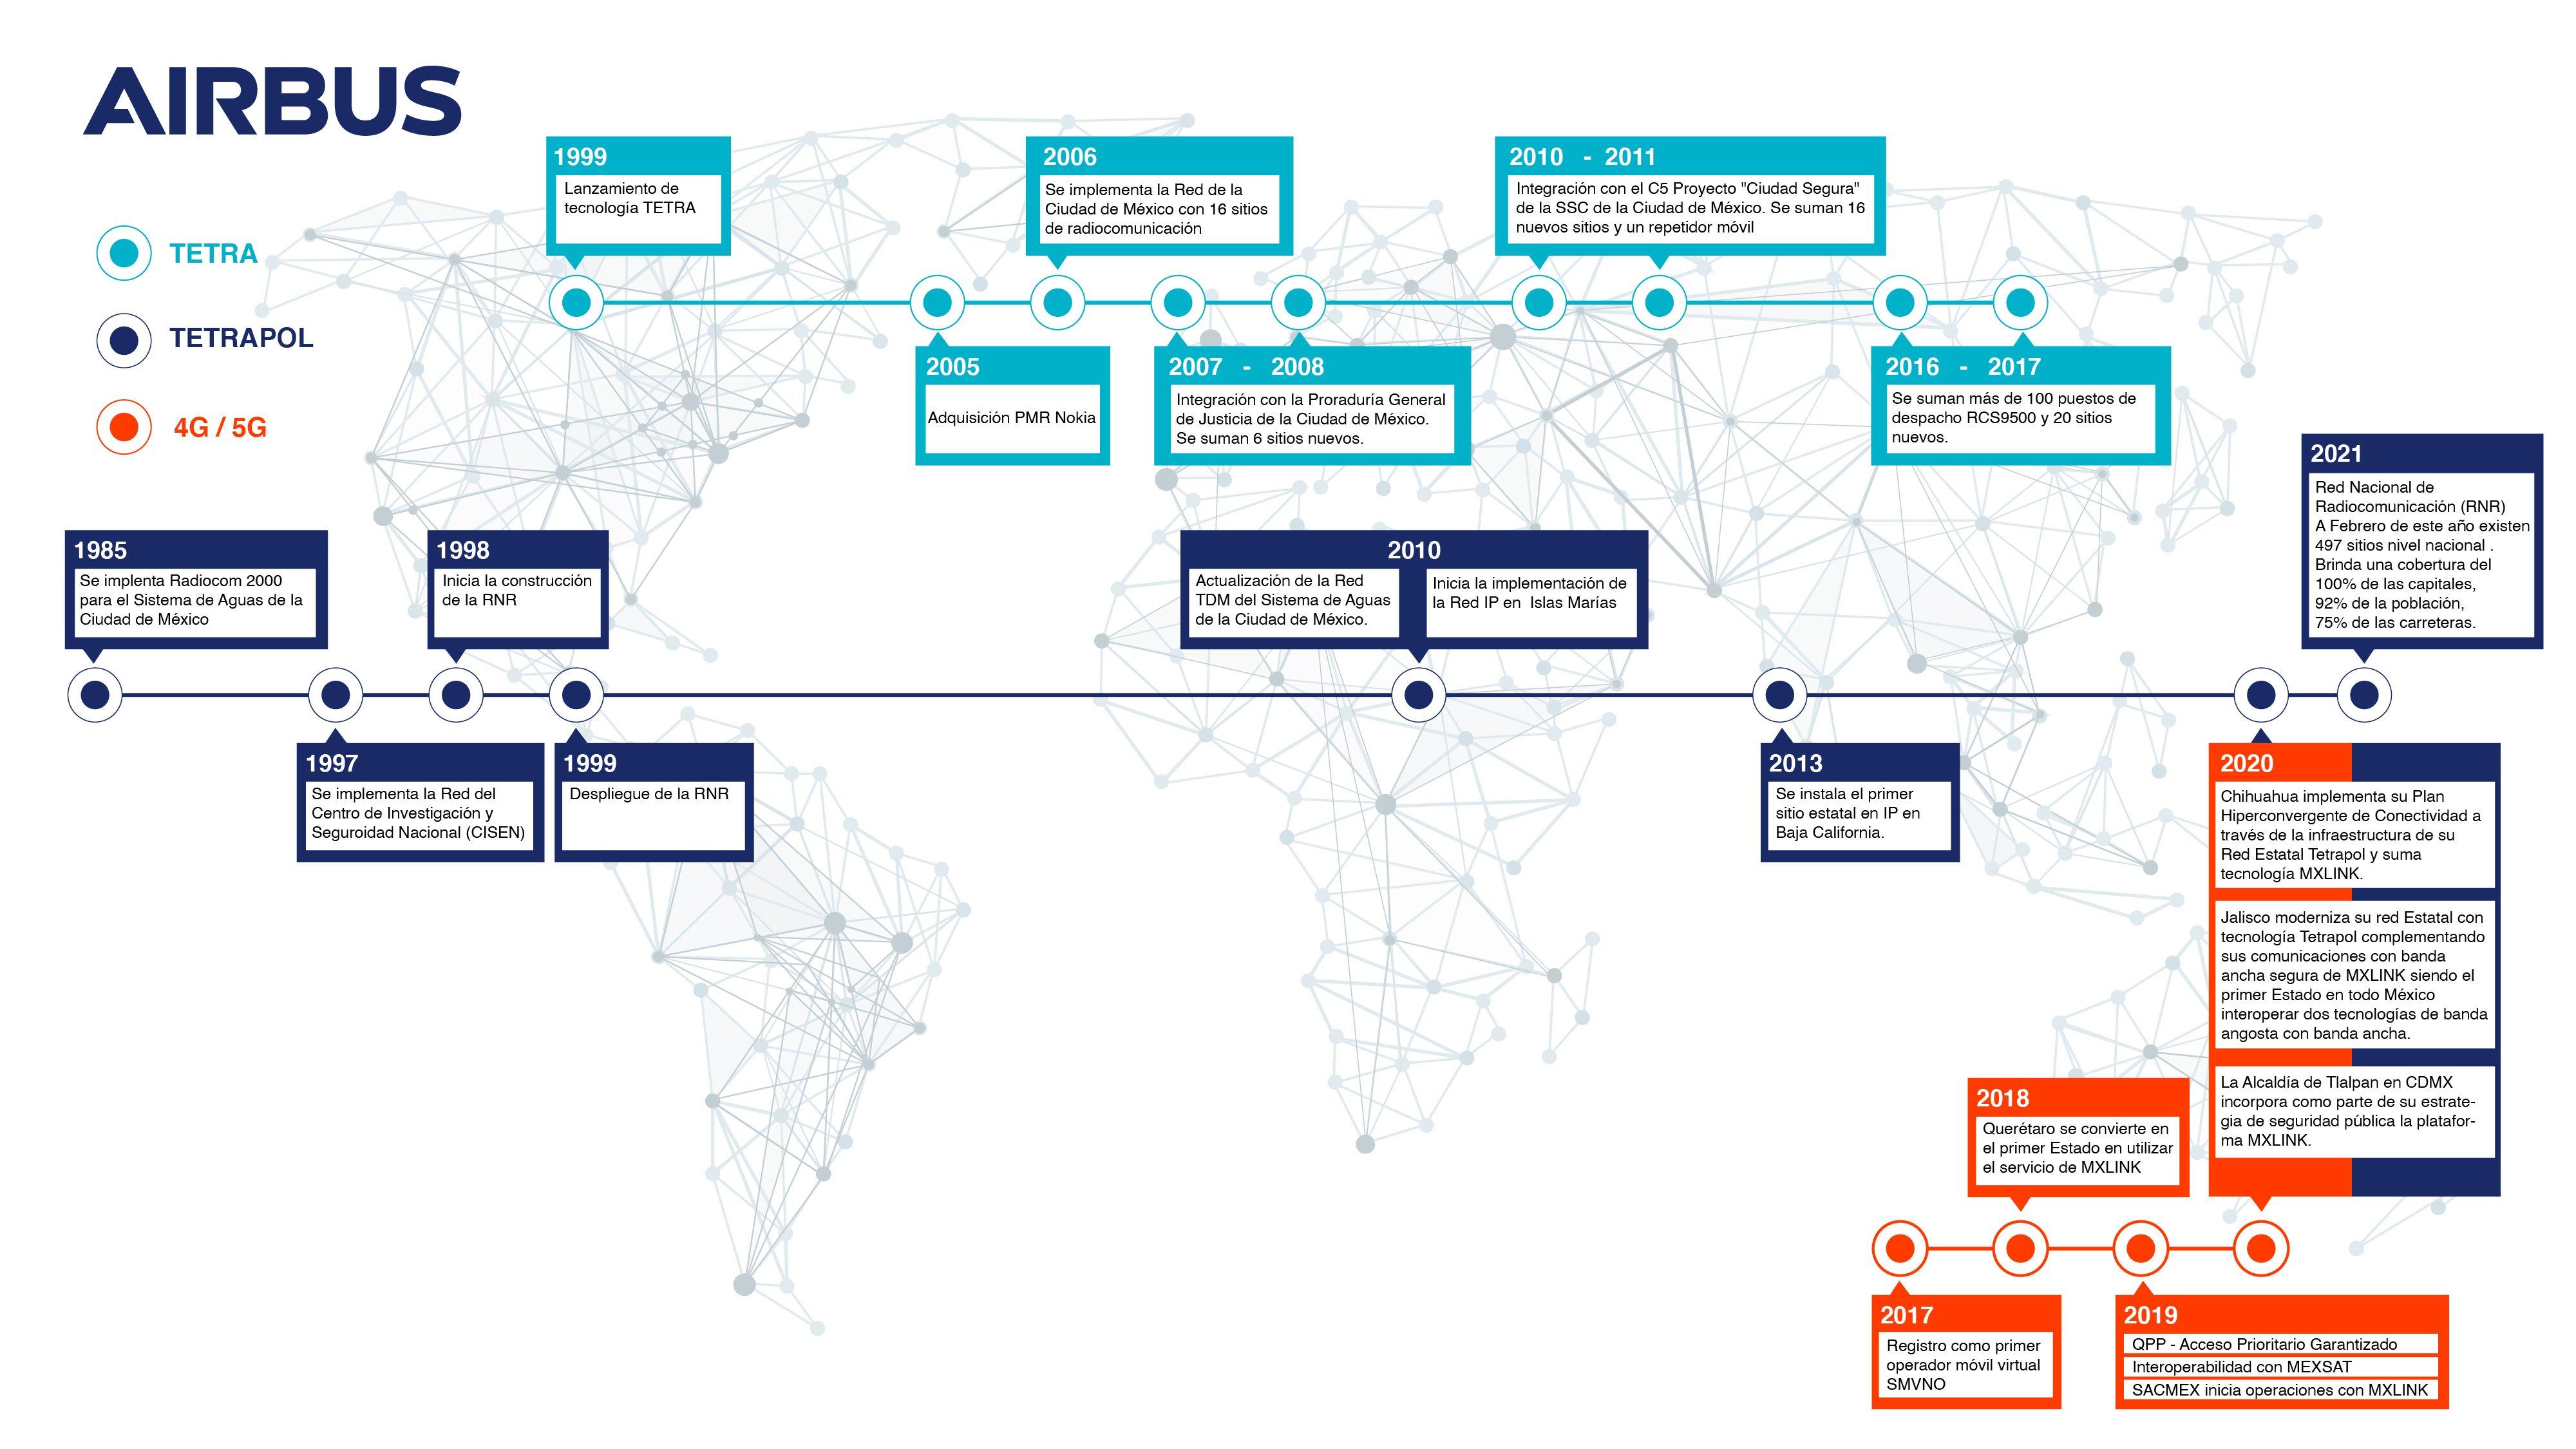 timeline-Airbus-slc